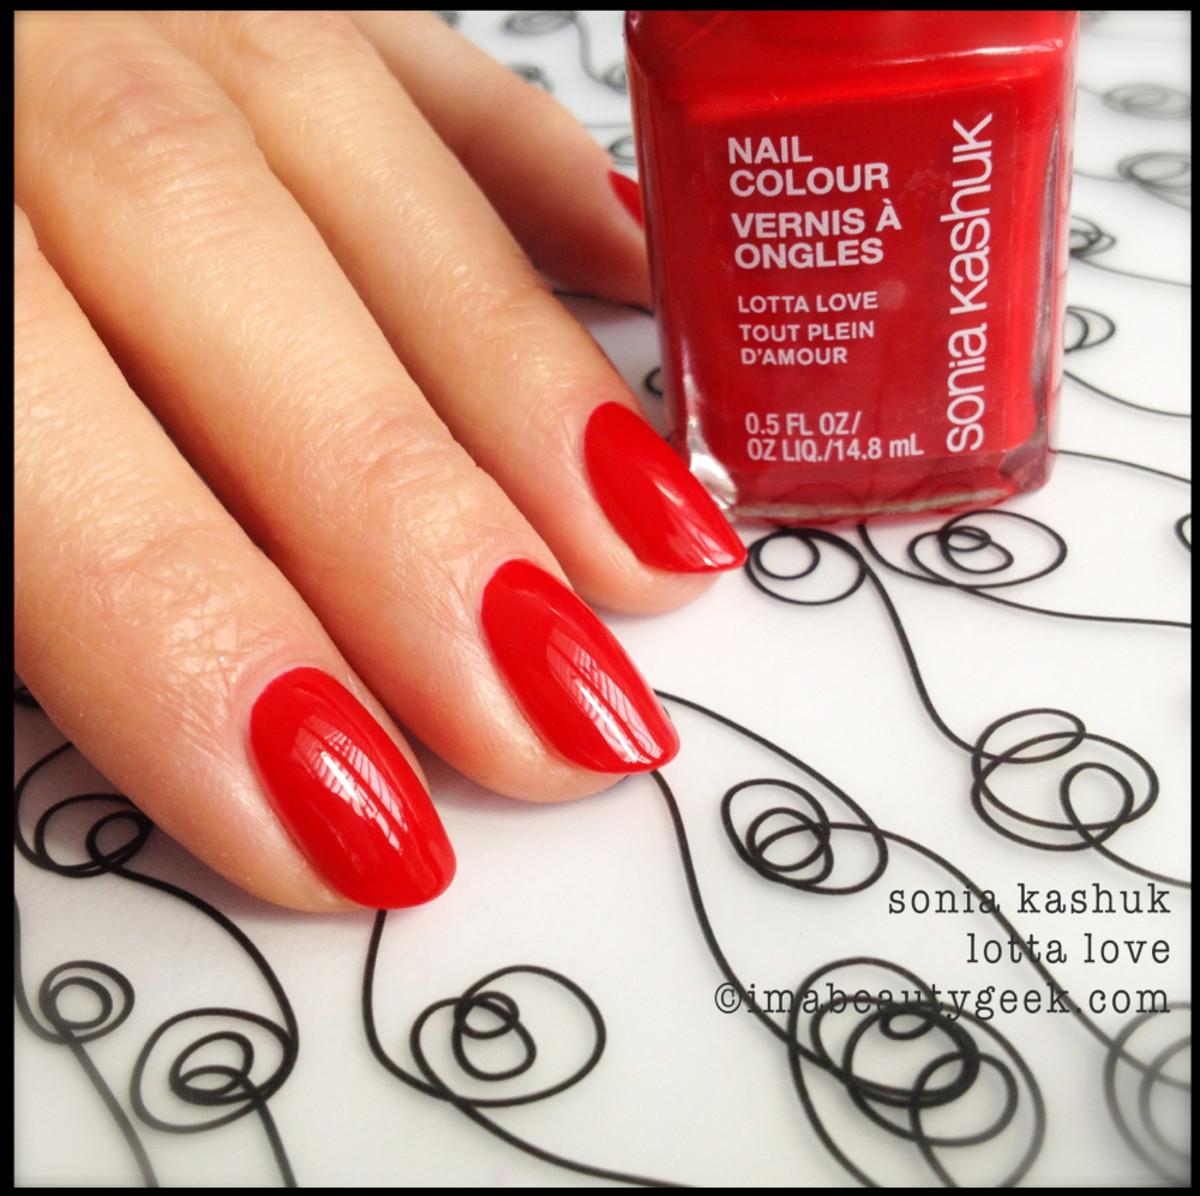 Sonia Kashuk Lotta Love_Sonia Kashuk nail polish Spring 2014